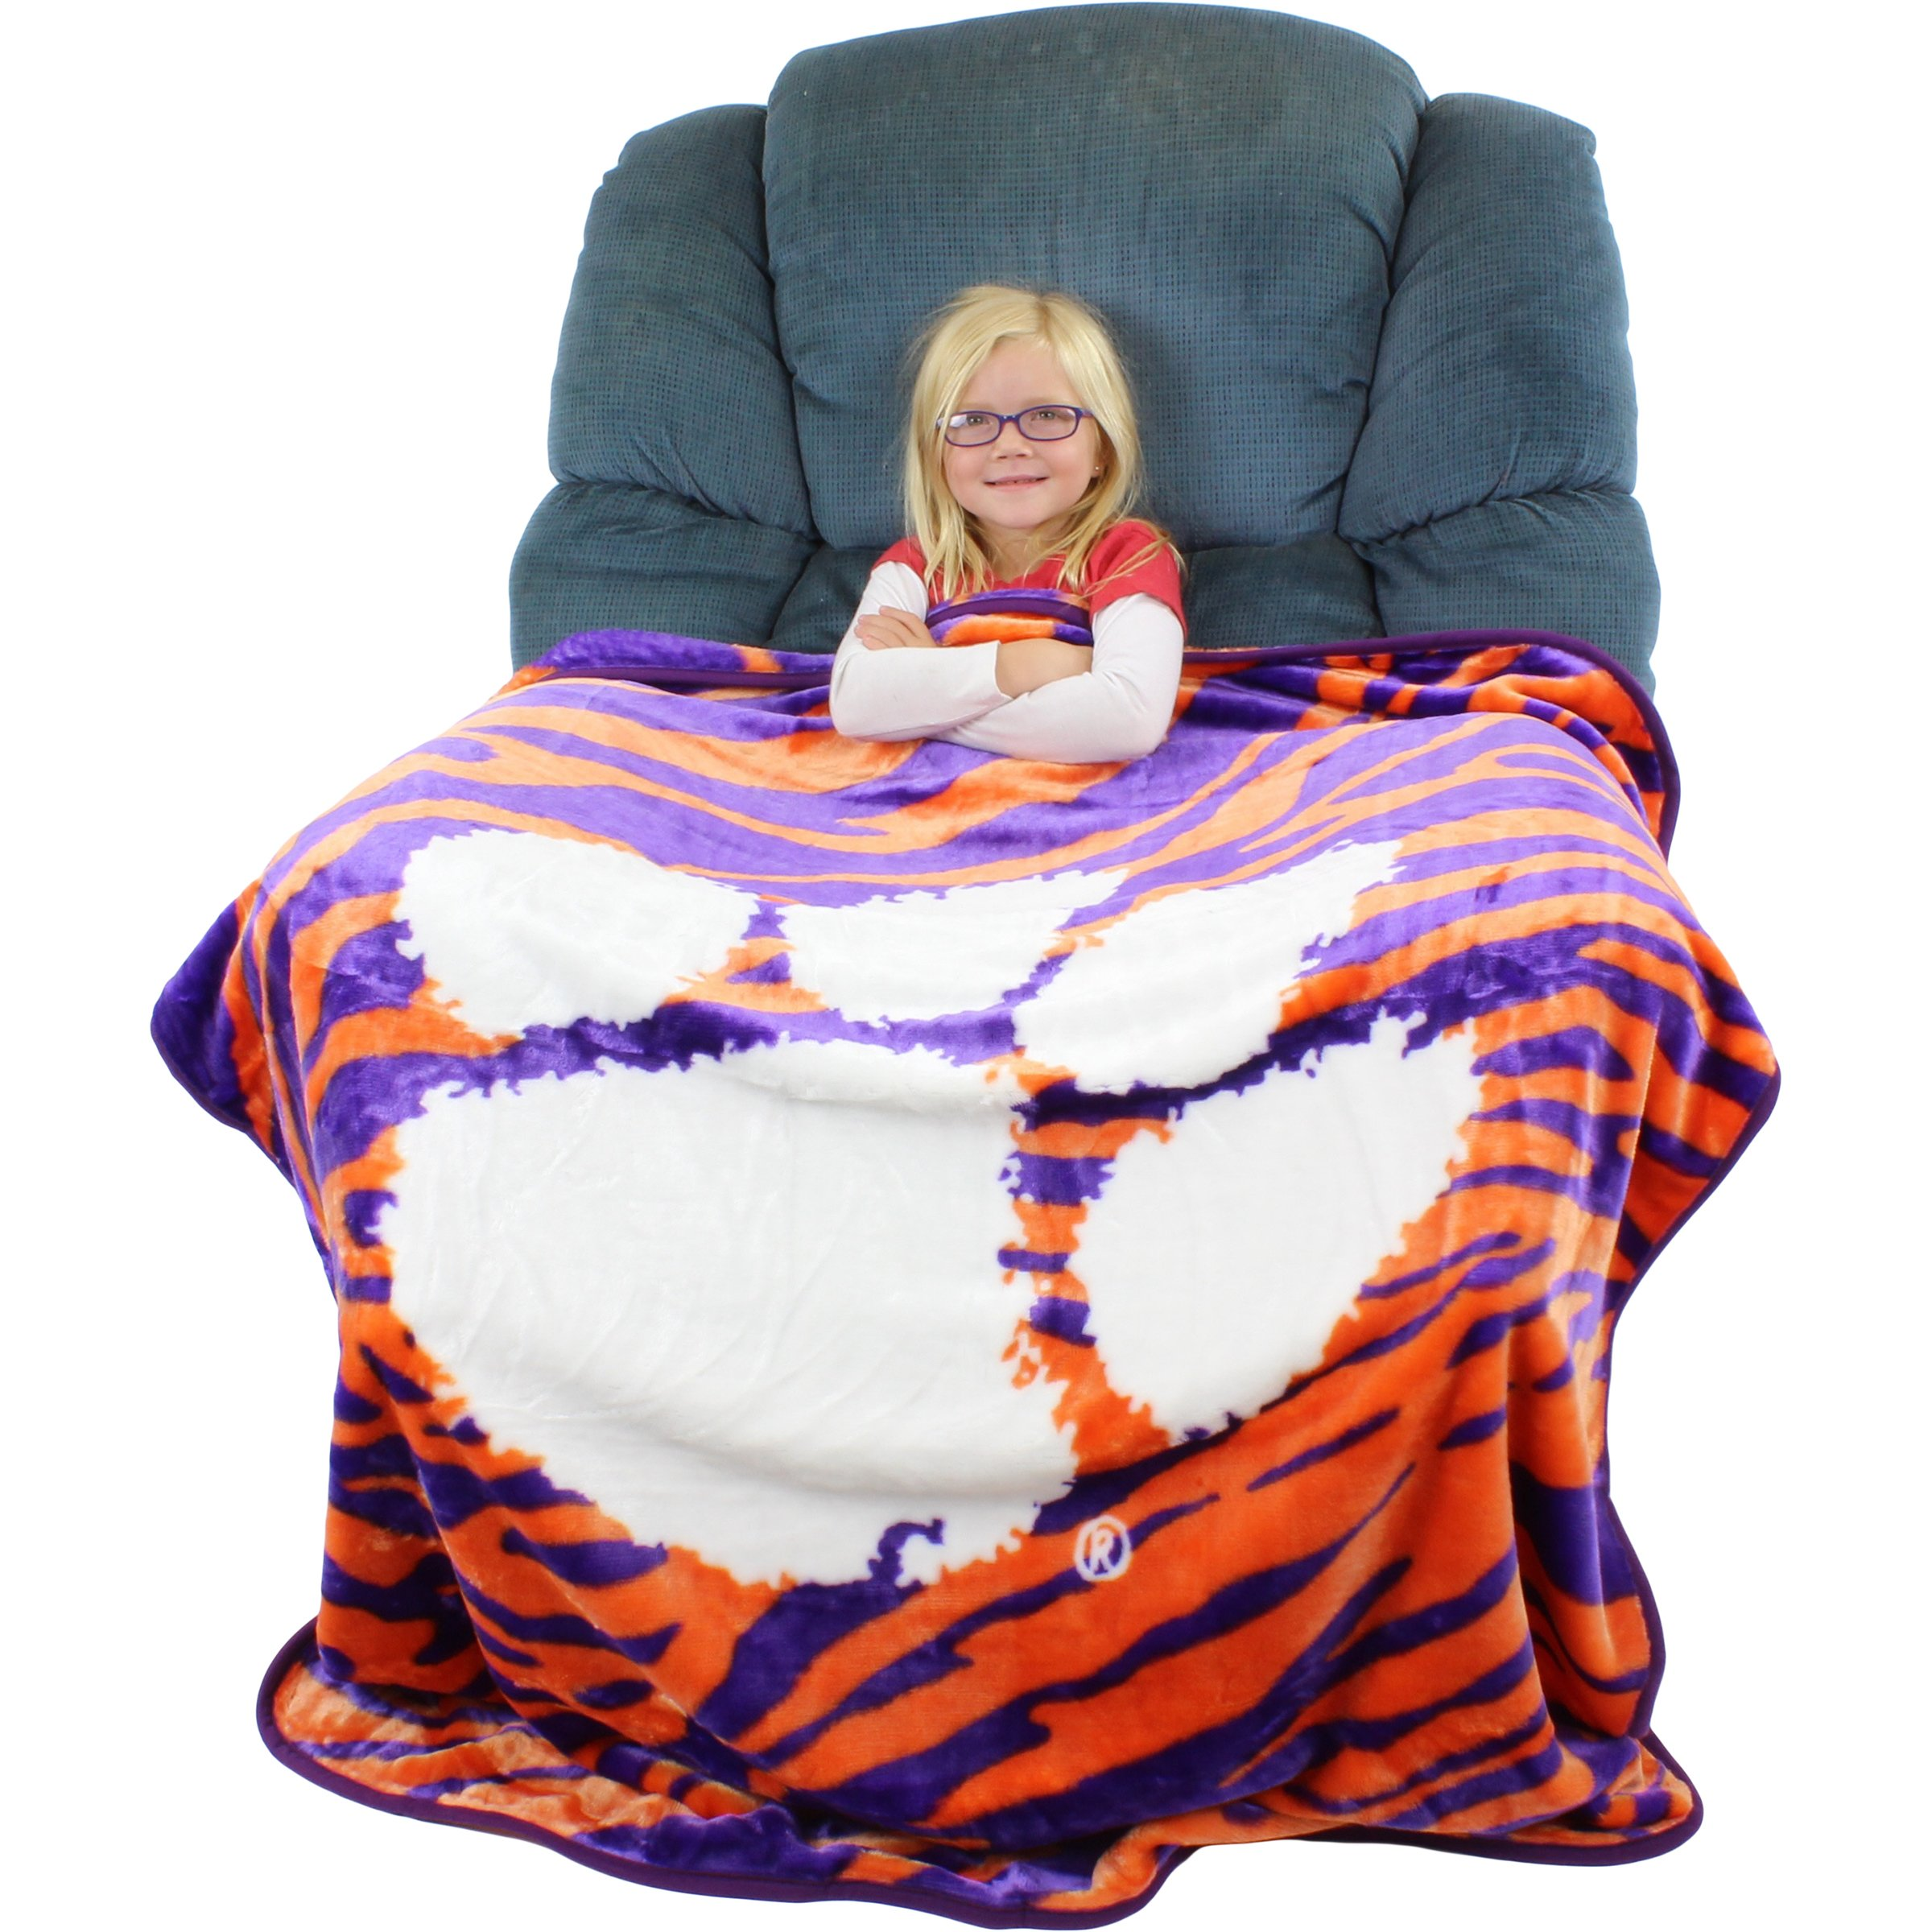 College Covers Clemson Tigers Super Soft Raschel Throw Blanket, 50'' x 60''